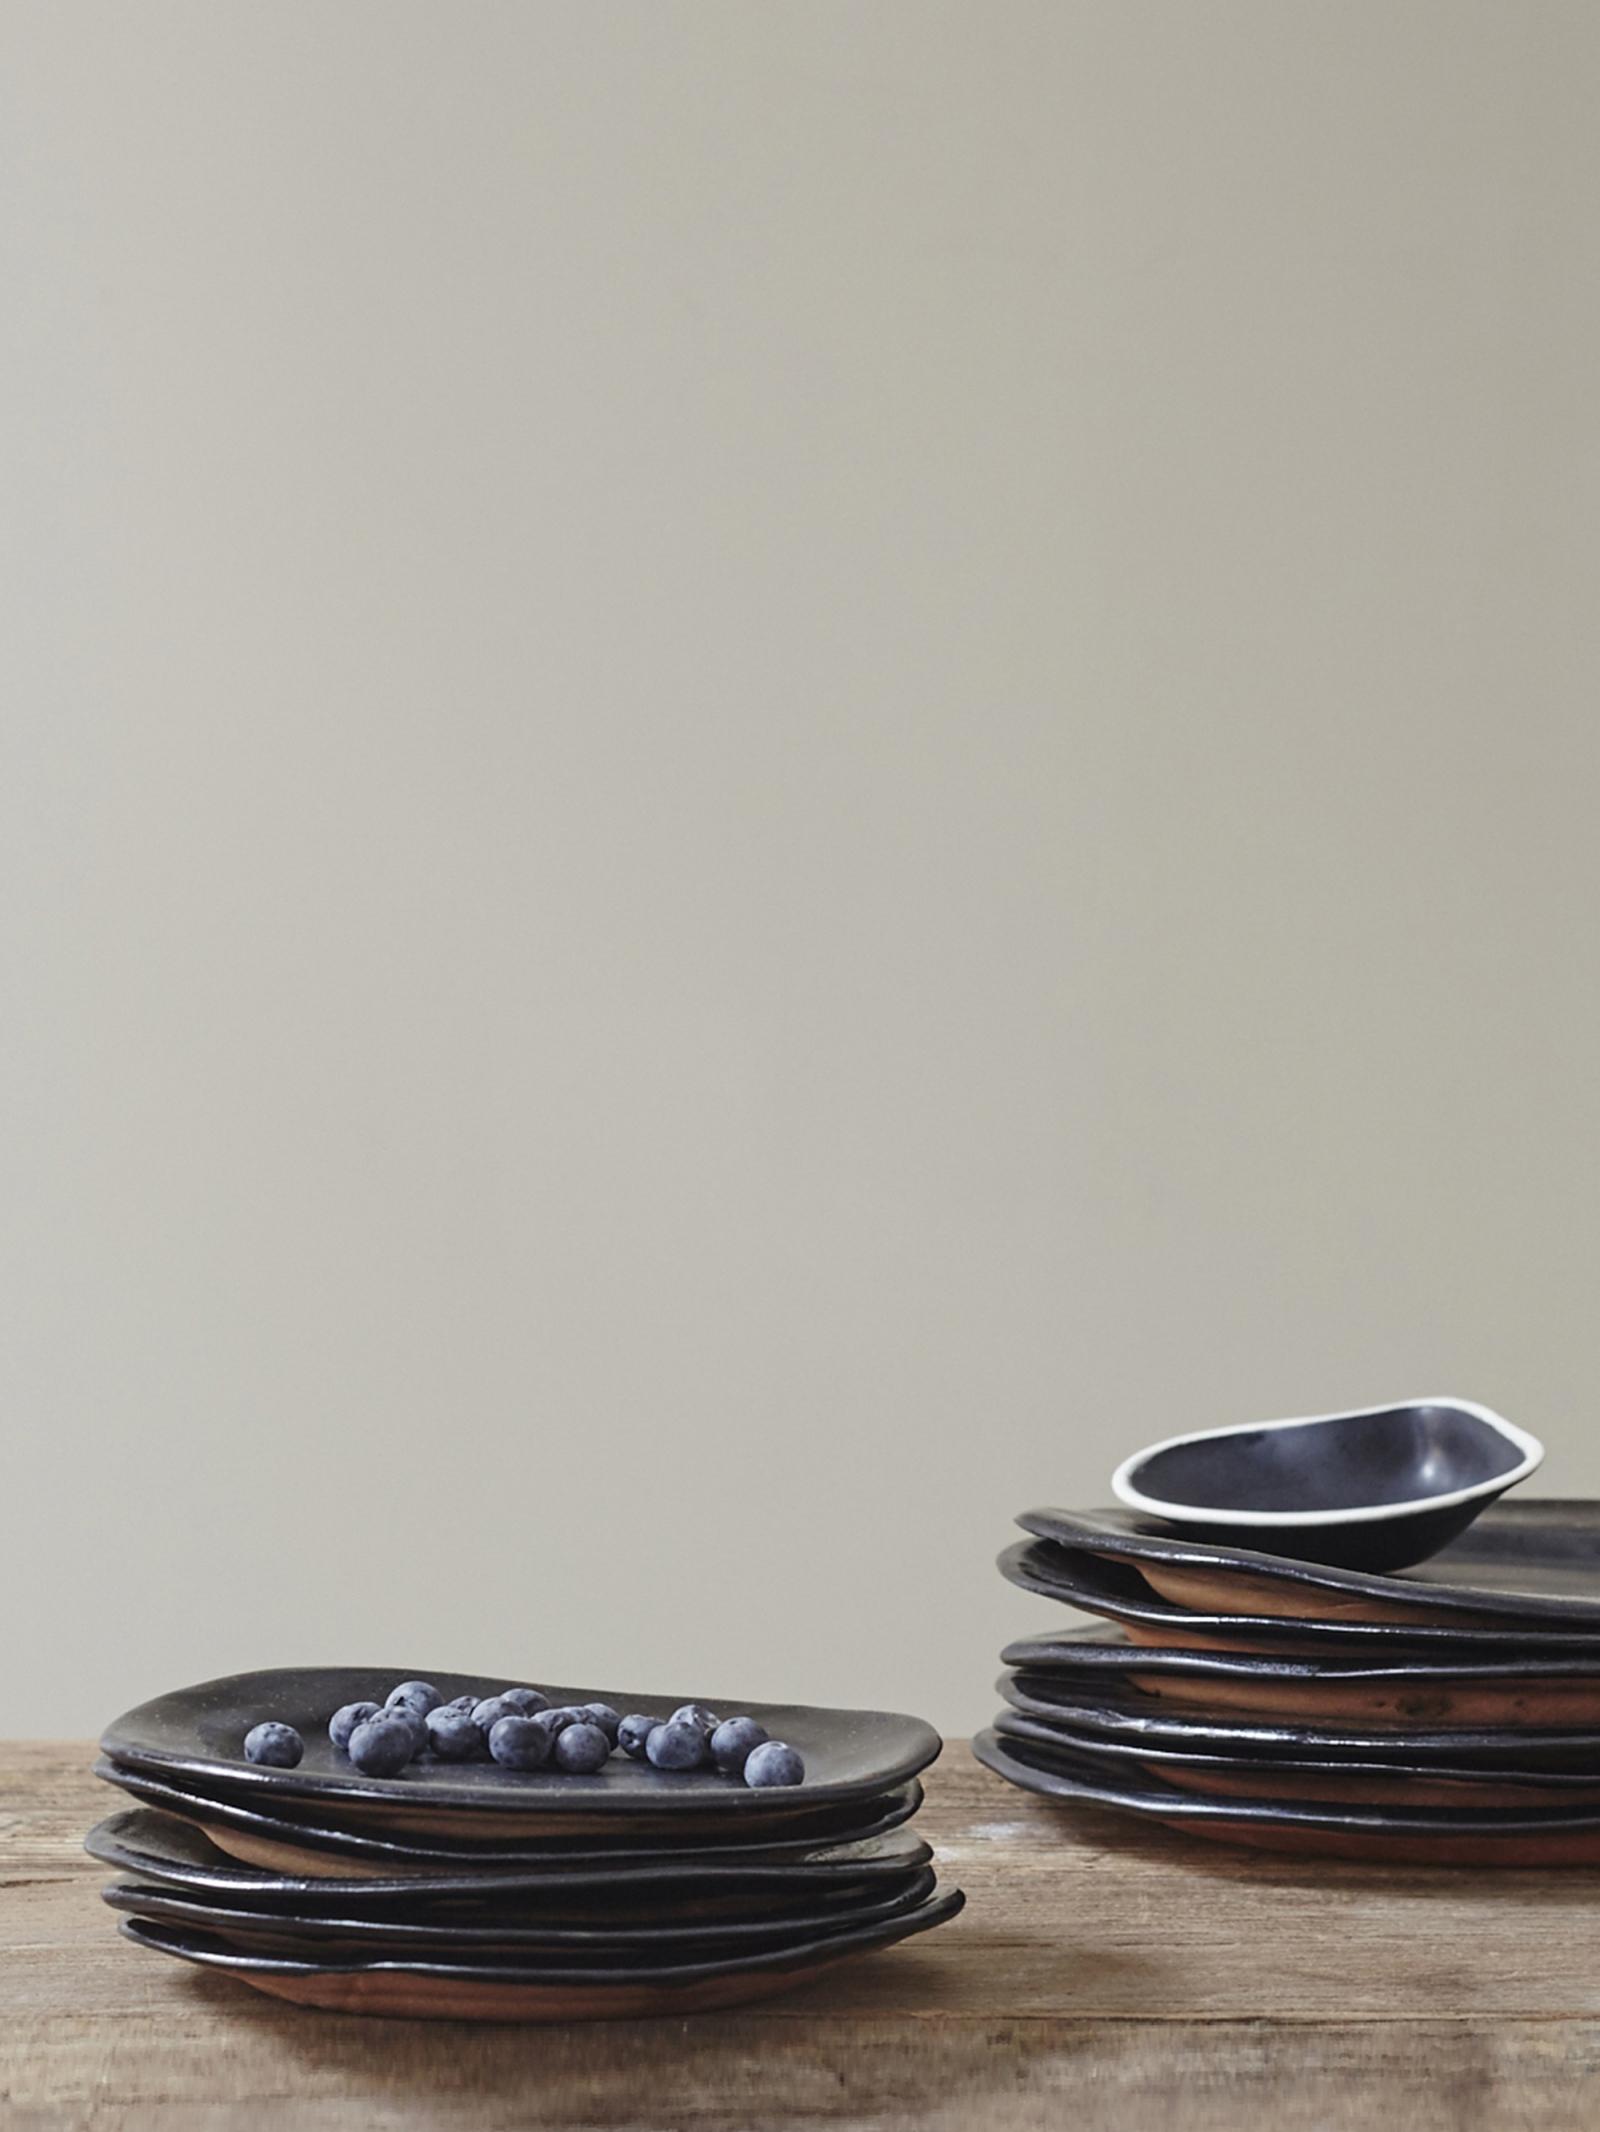 Dinner Plate - Birgitta